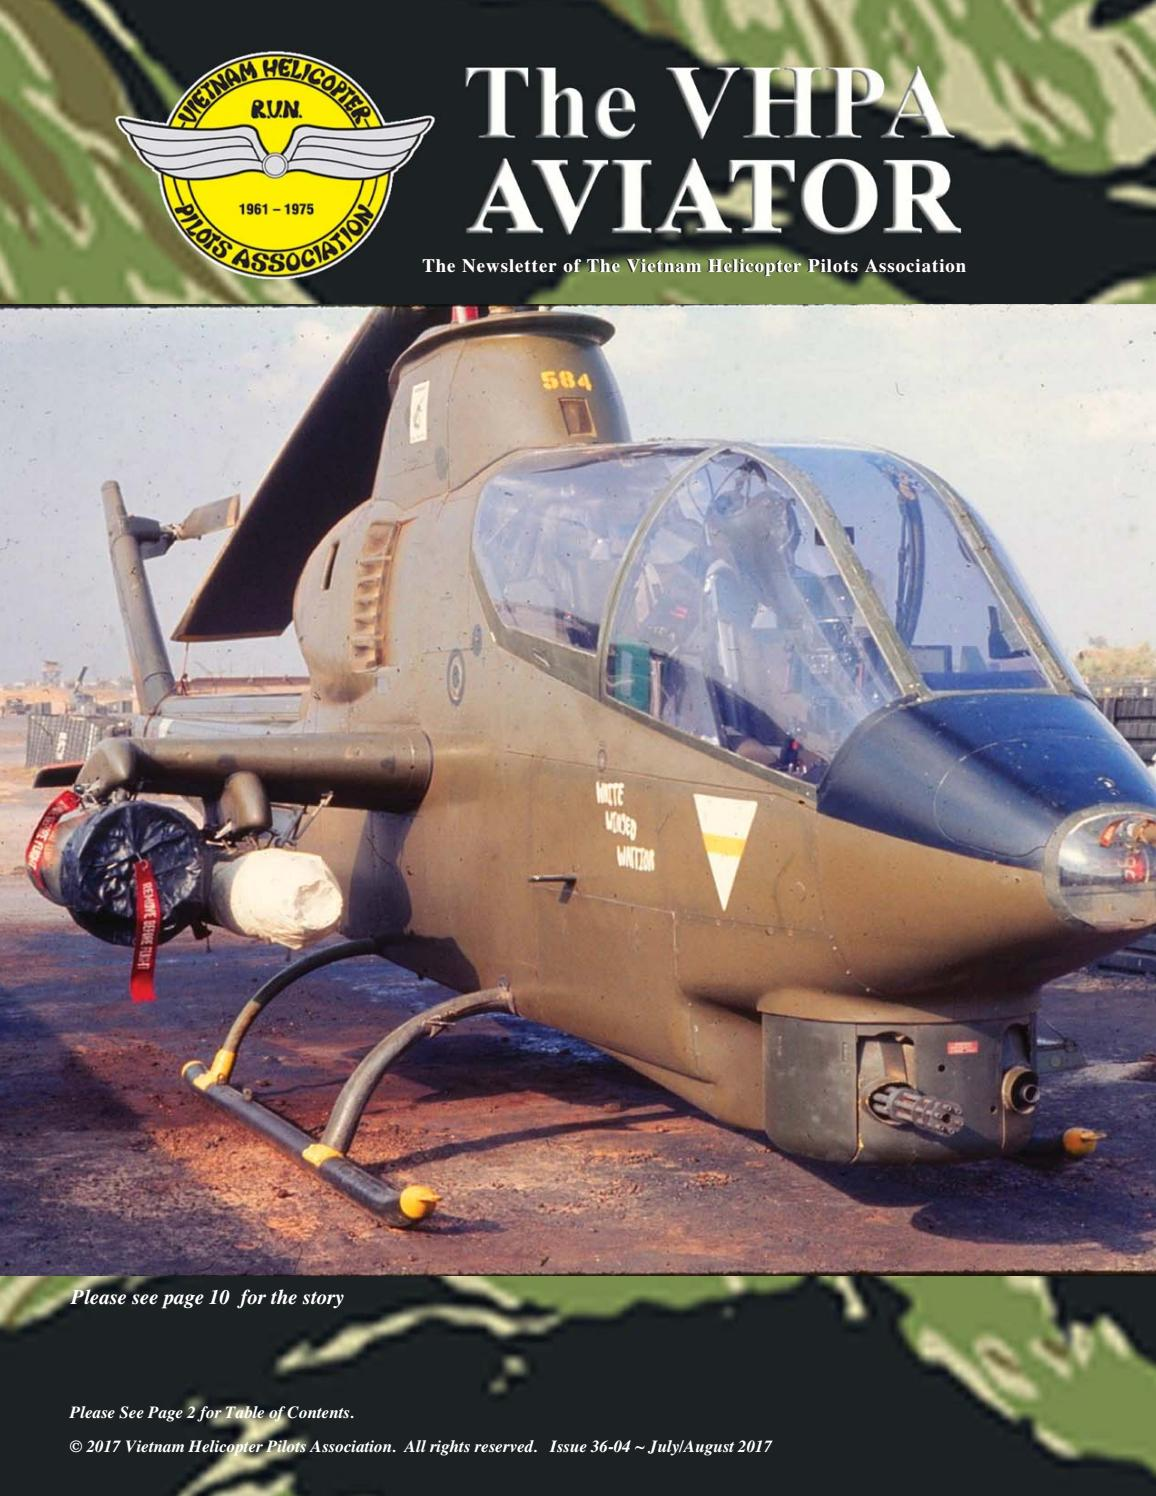 174th ahc 2015 reunion - The Vhpa Aviator